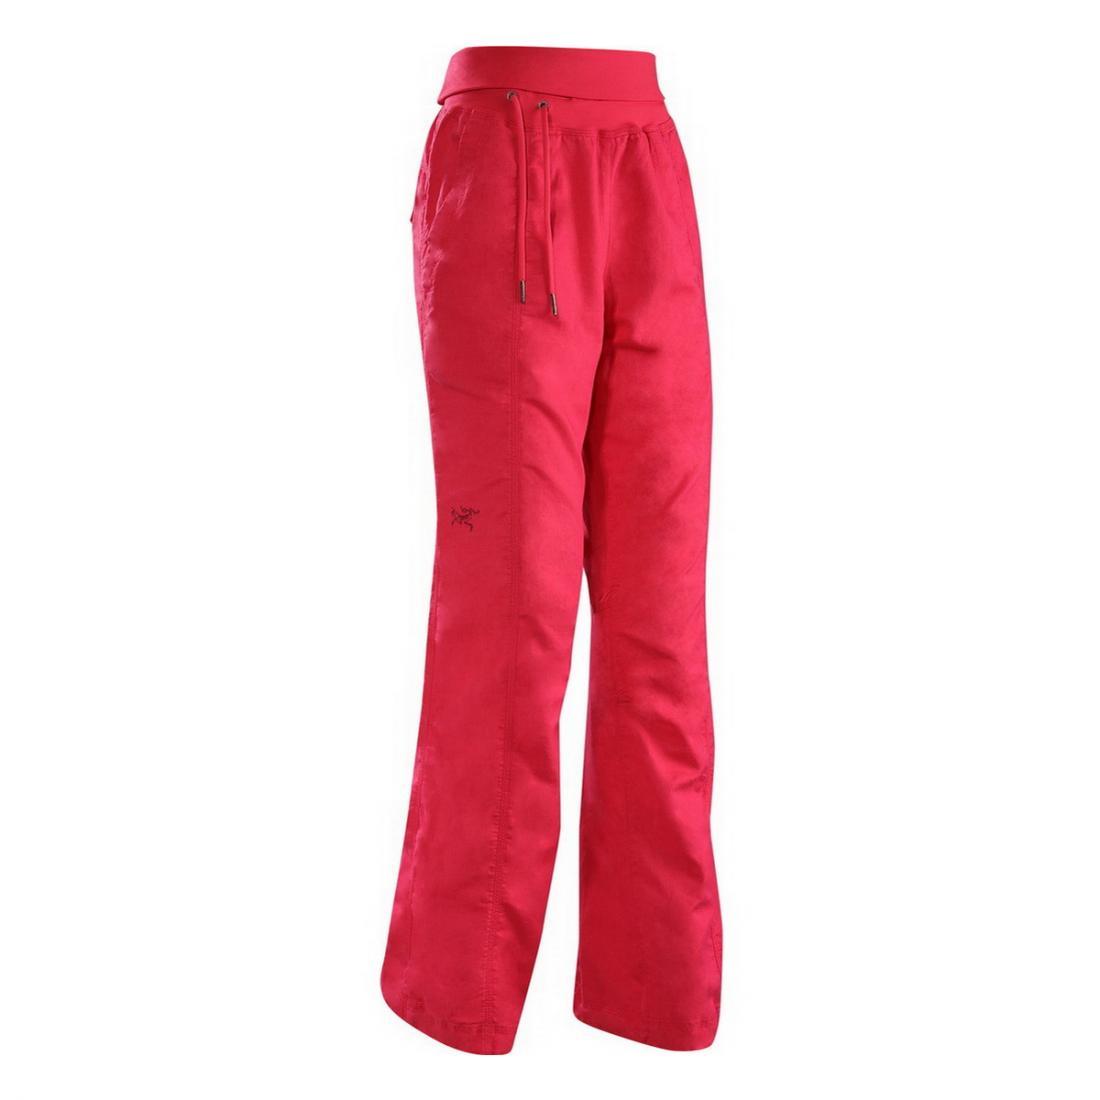 Брюки Roxen Pant жен.Брюки, штаны<br><br><br>Цвет: Розовый<br>Размер: 6